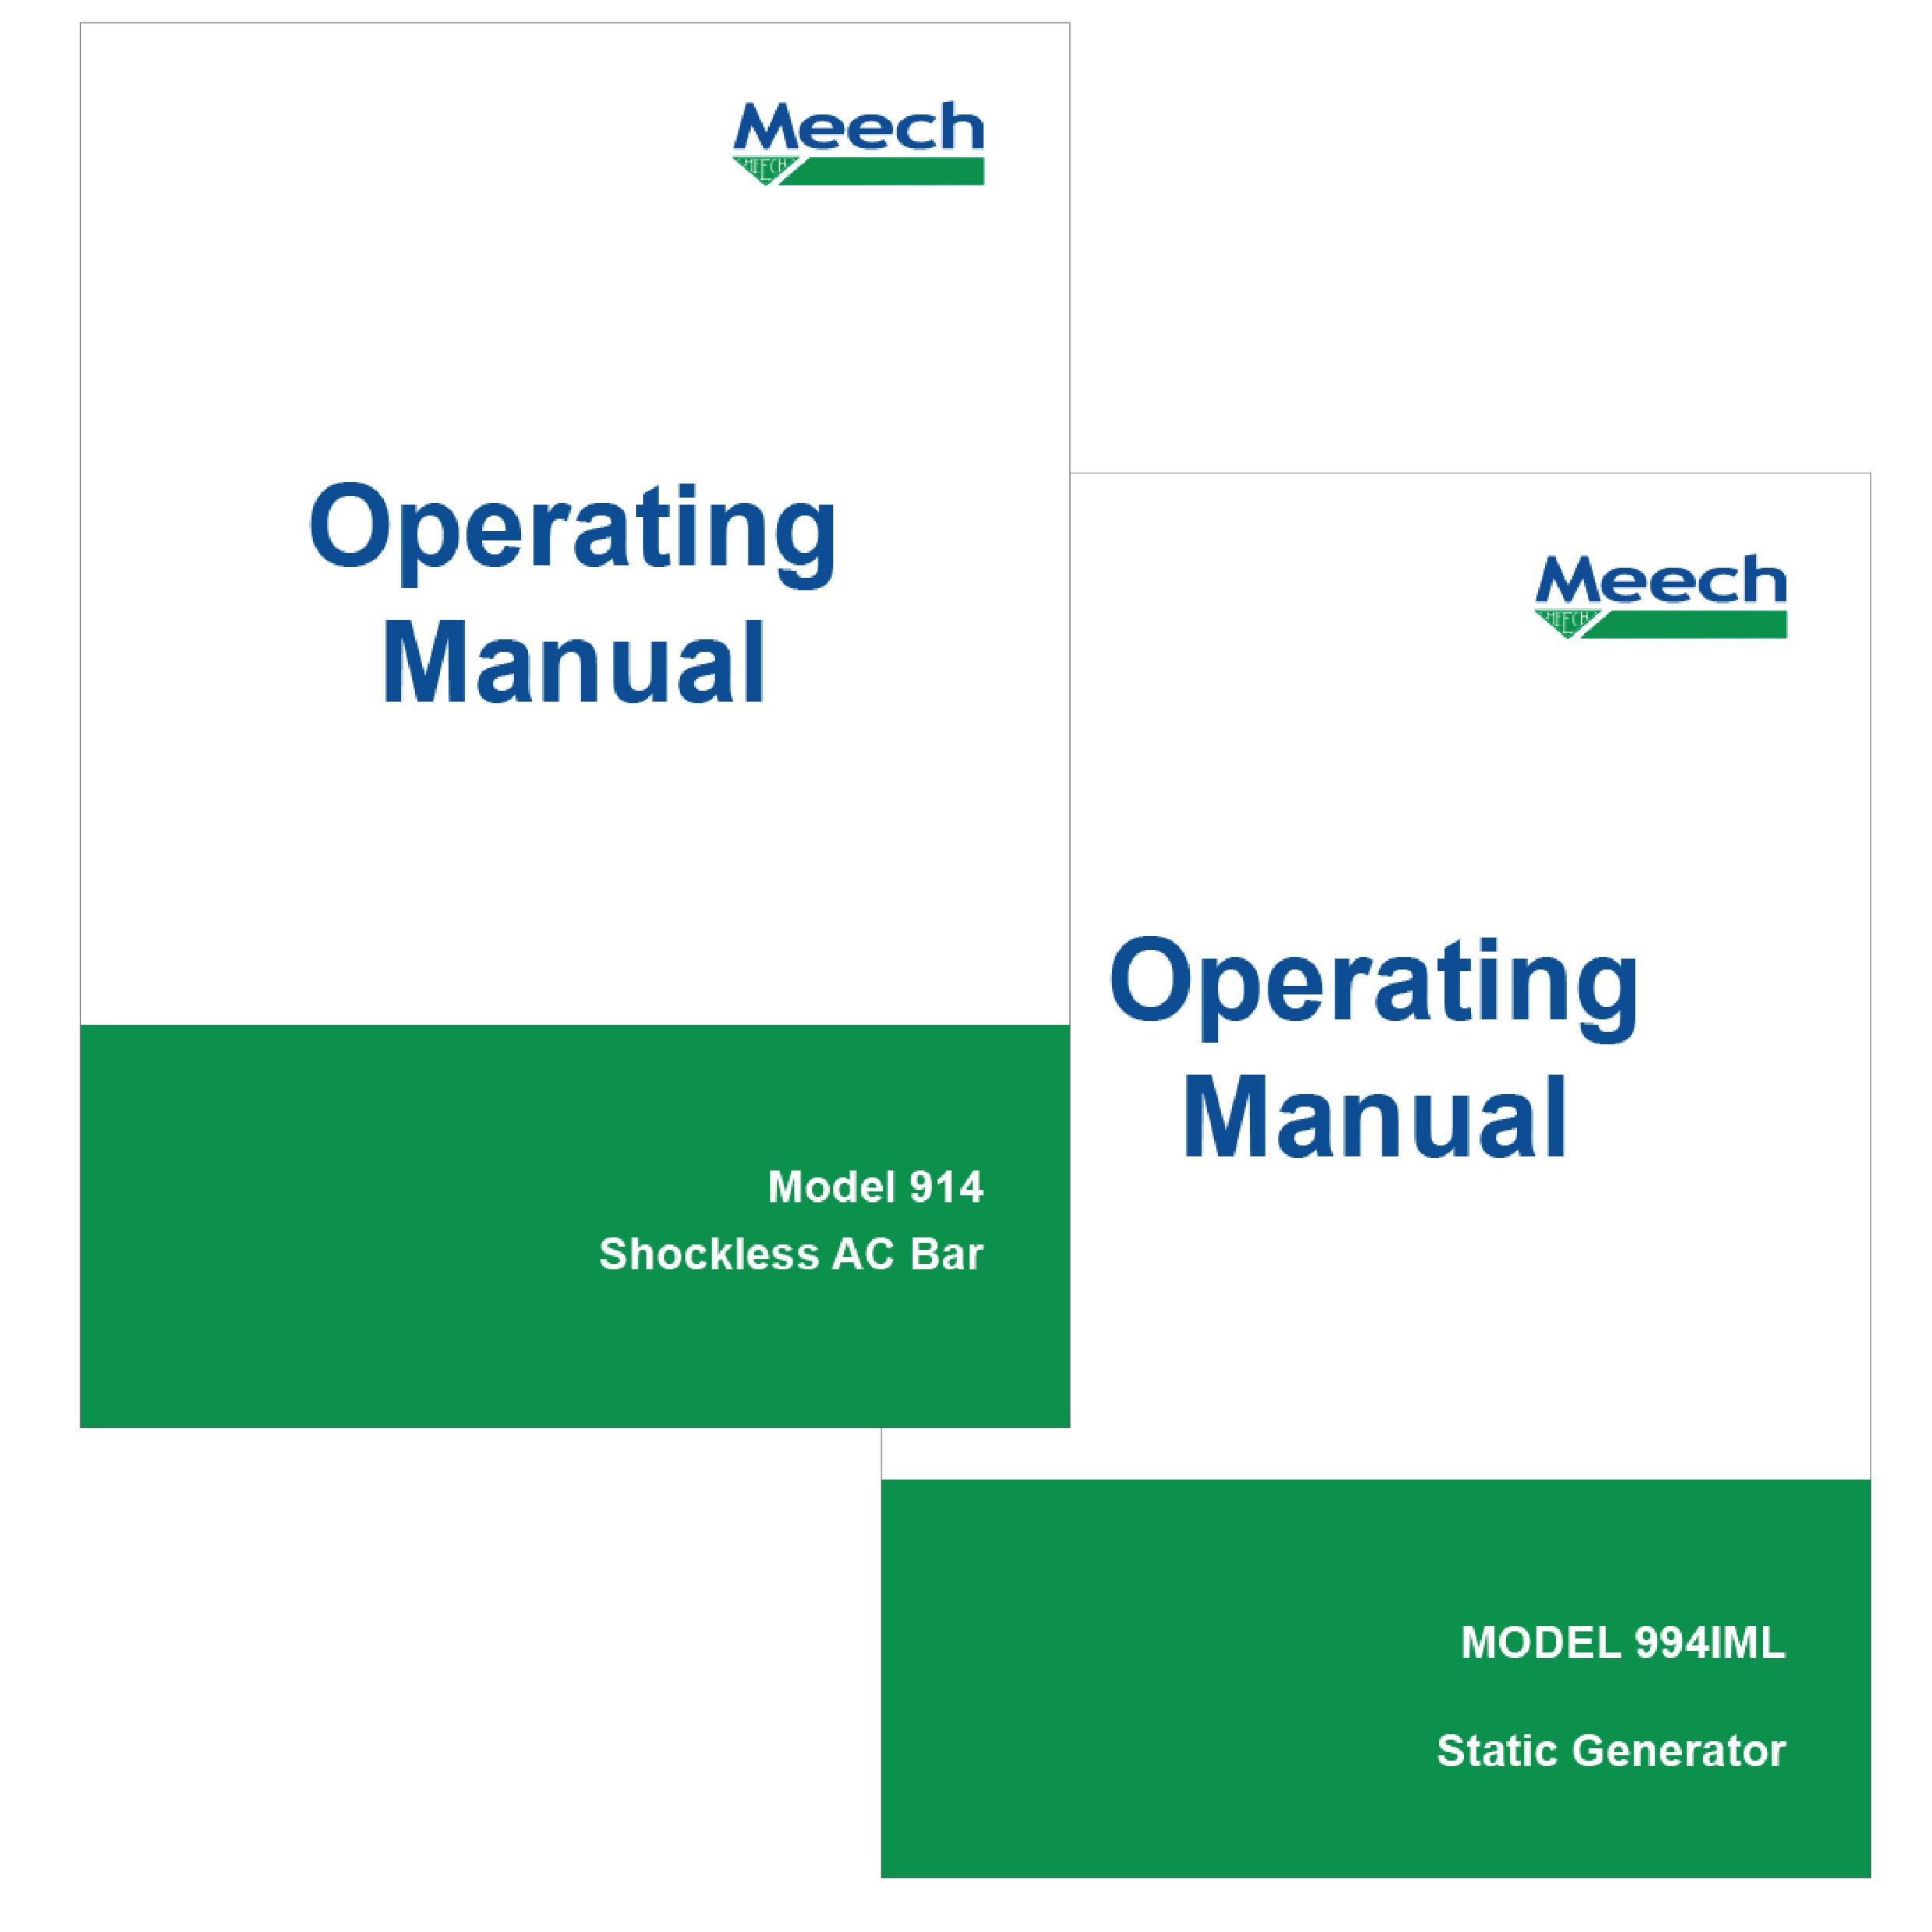 900 Series Operating Manuals